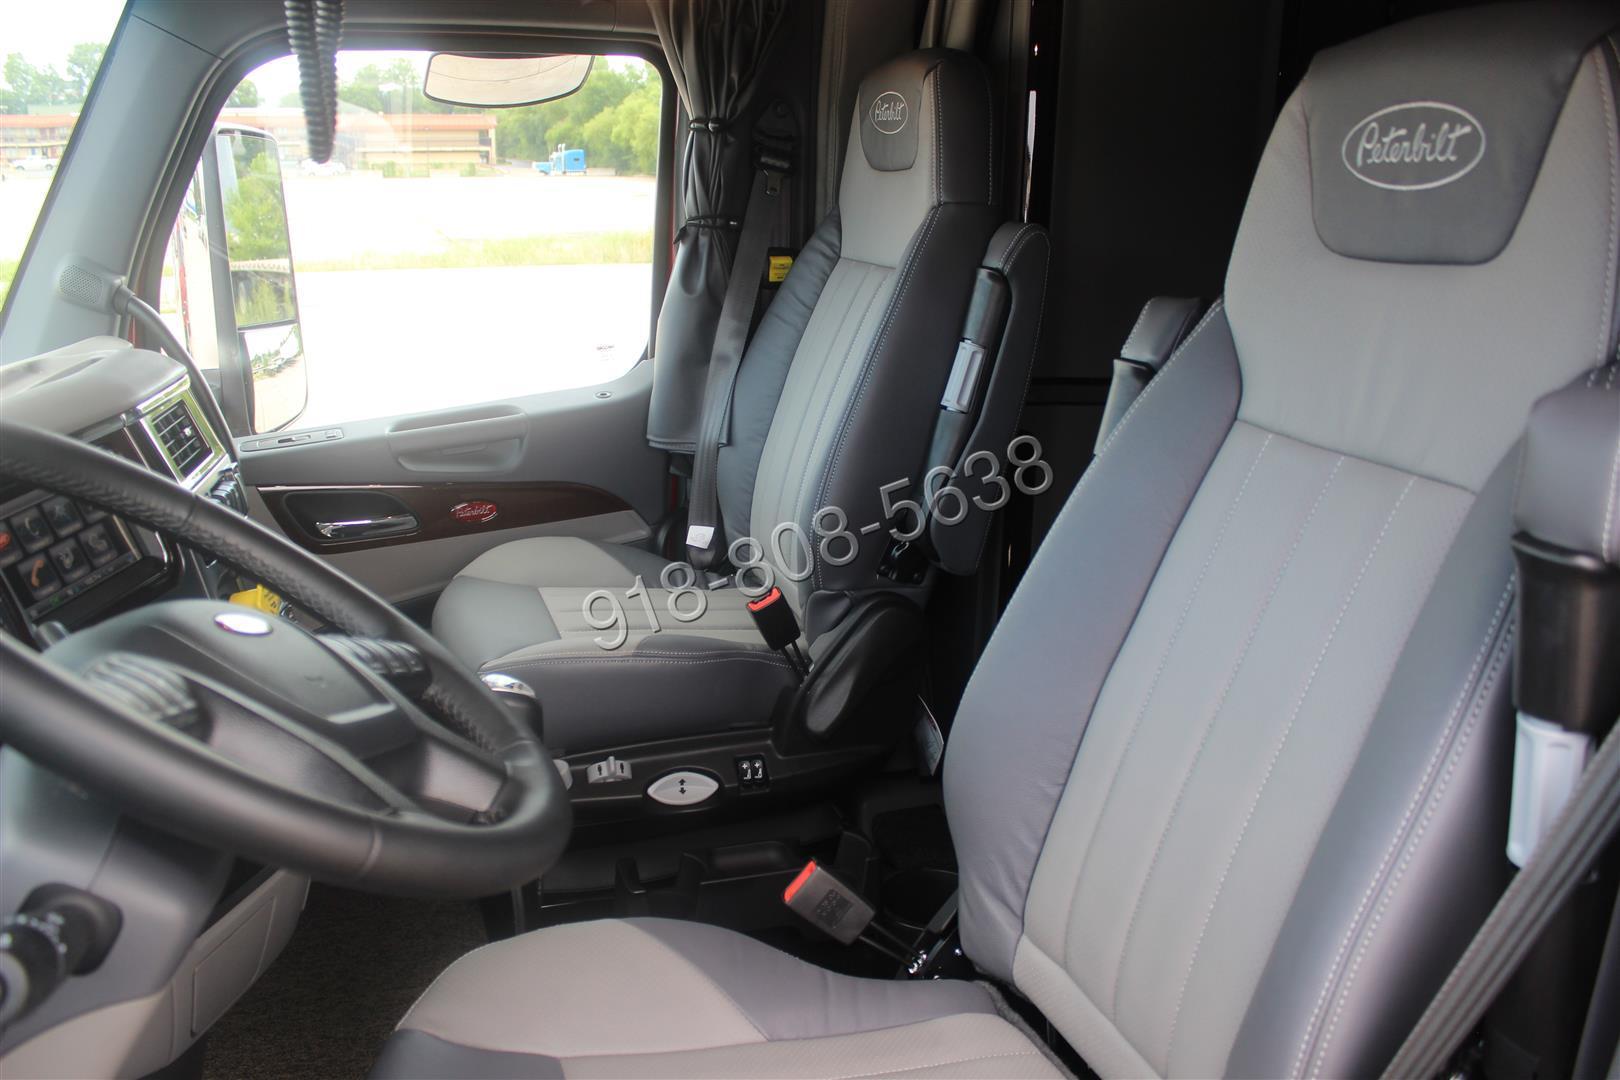 ... 579 Peterbilt Platinum Interior All The Options VIDEO 550hp. TD011901